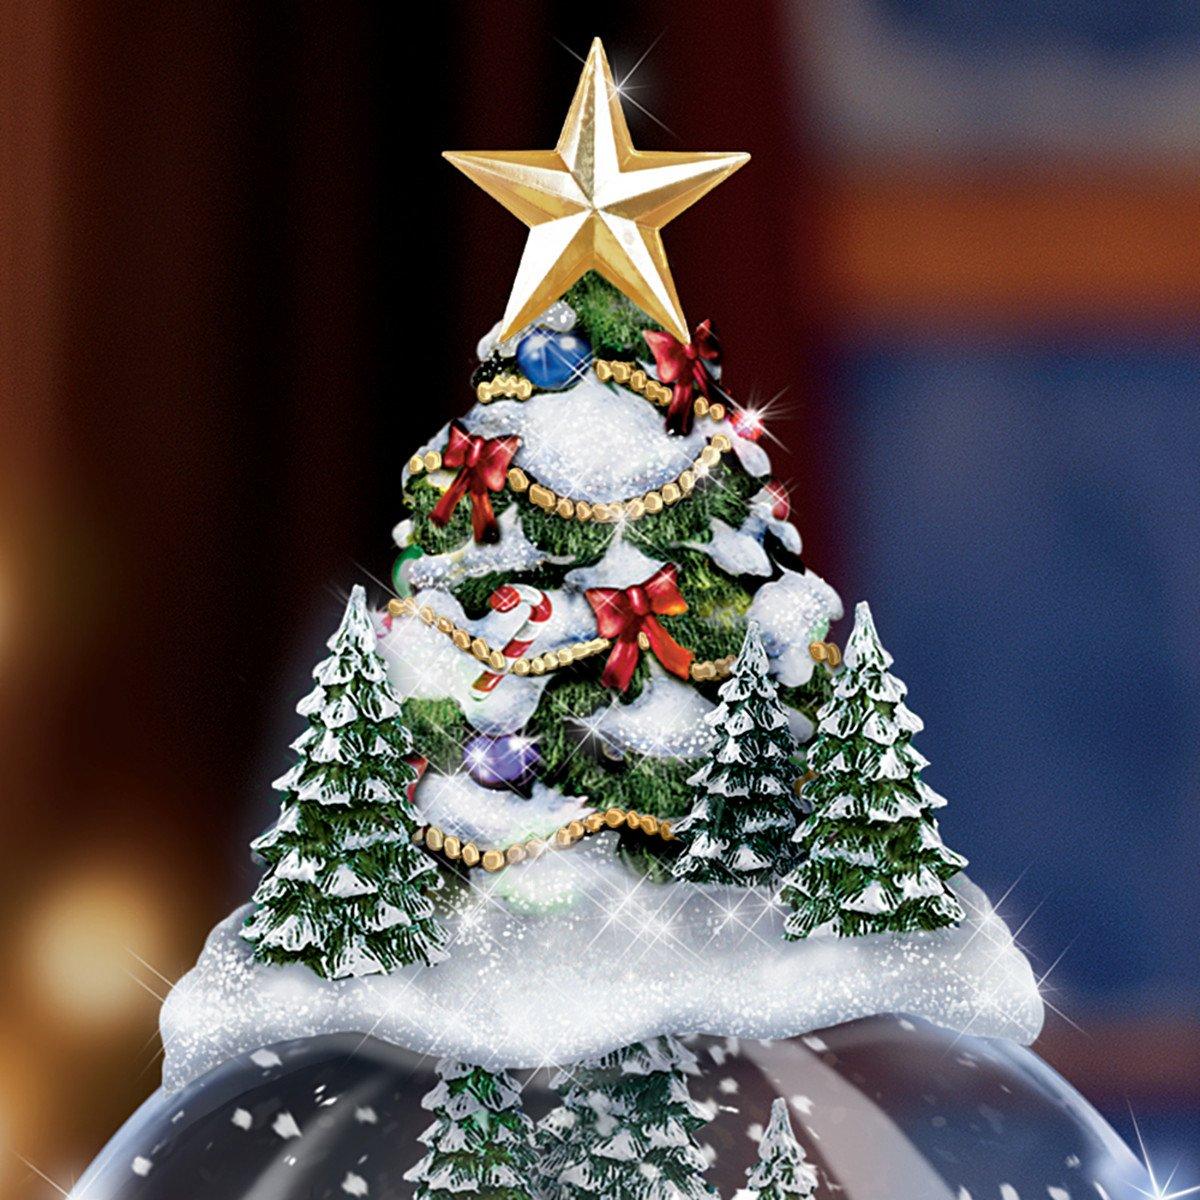 Kinkade christmas ornaments - Amazon Com Thomas Kinkade Wondrous Winter Musical Tabletop Christmas Tree With Snowglobe Lights Up By The Bradford Exchange Home Kitchen